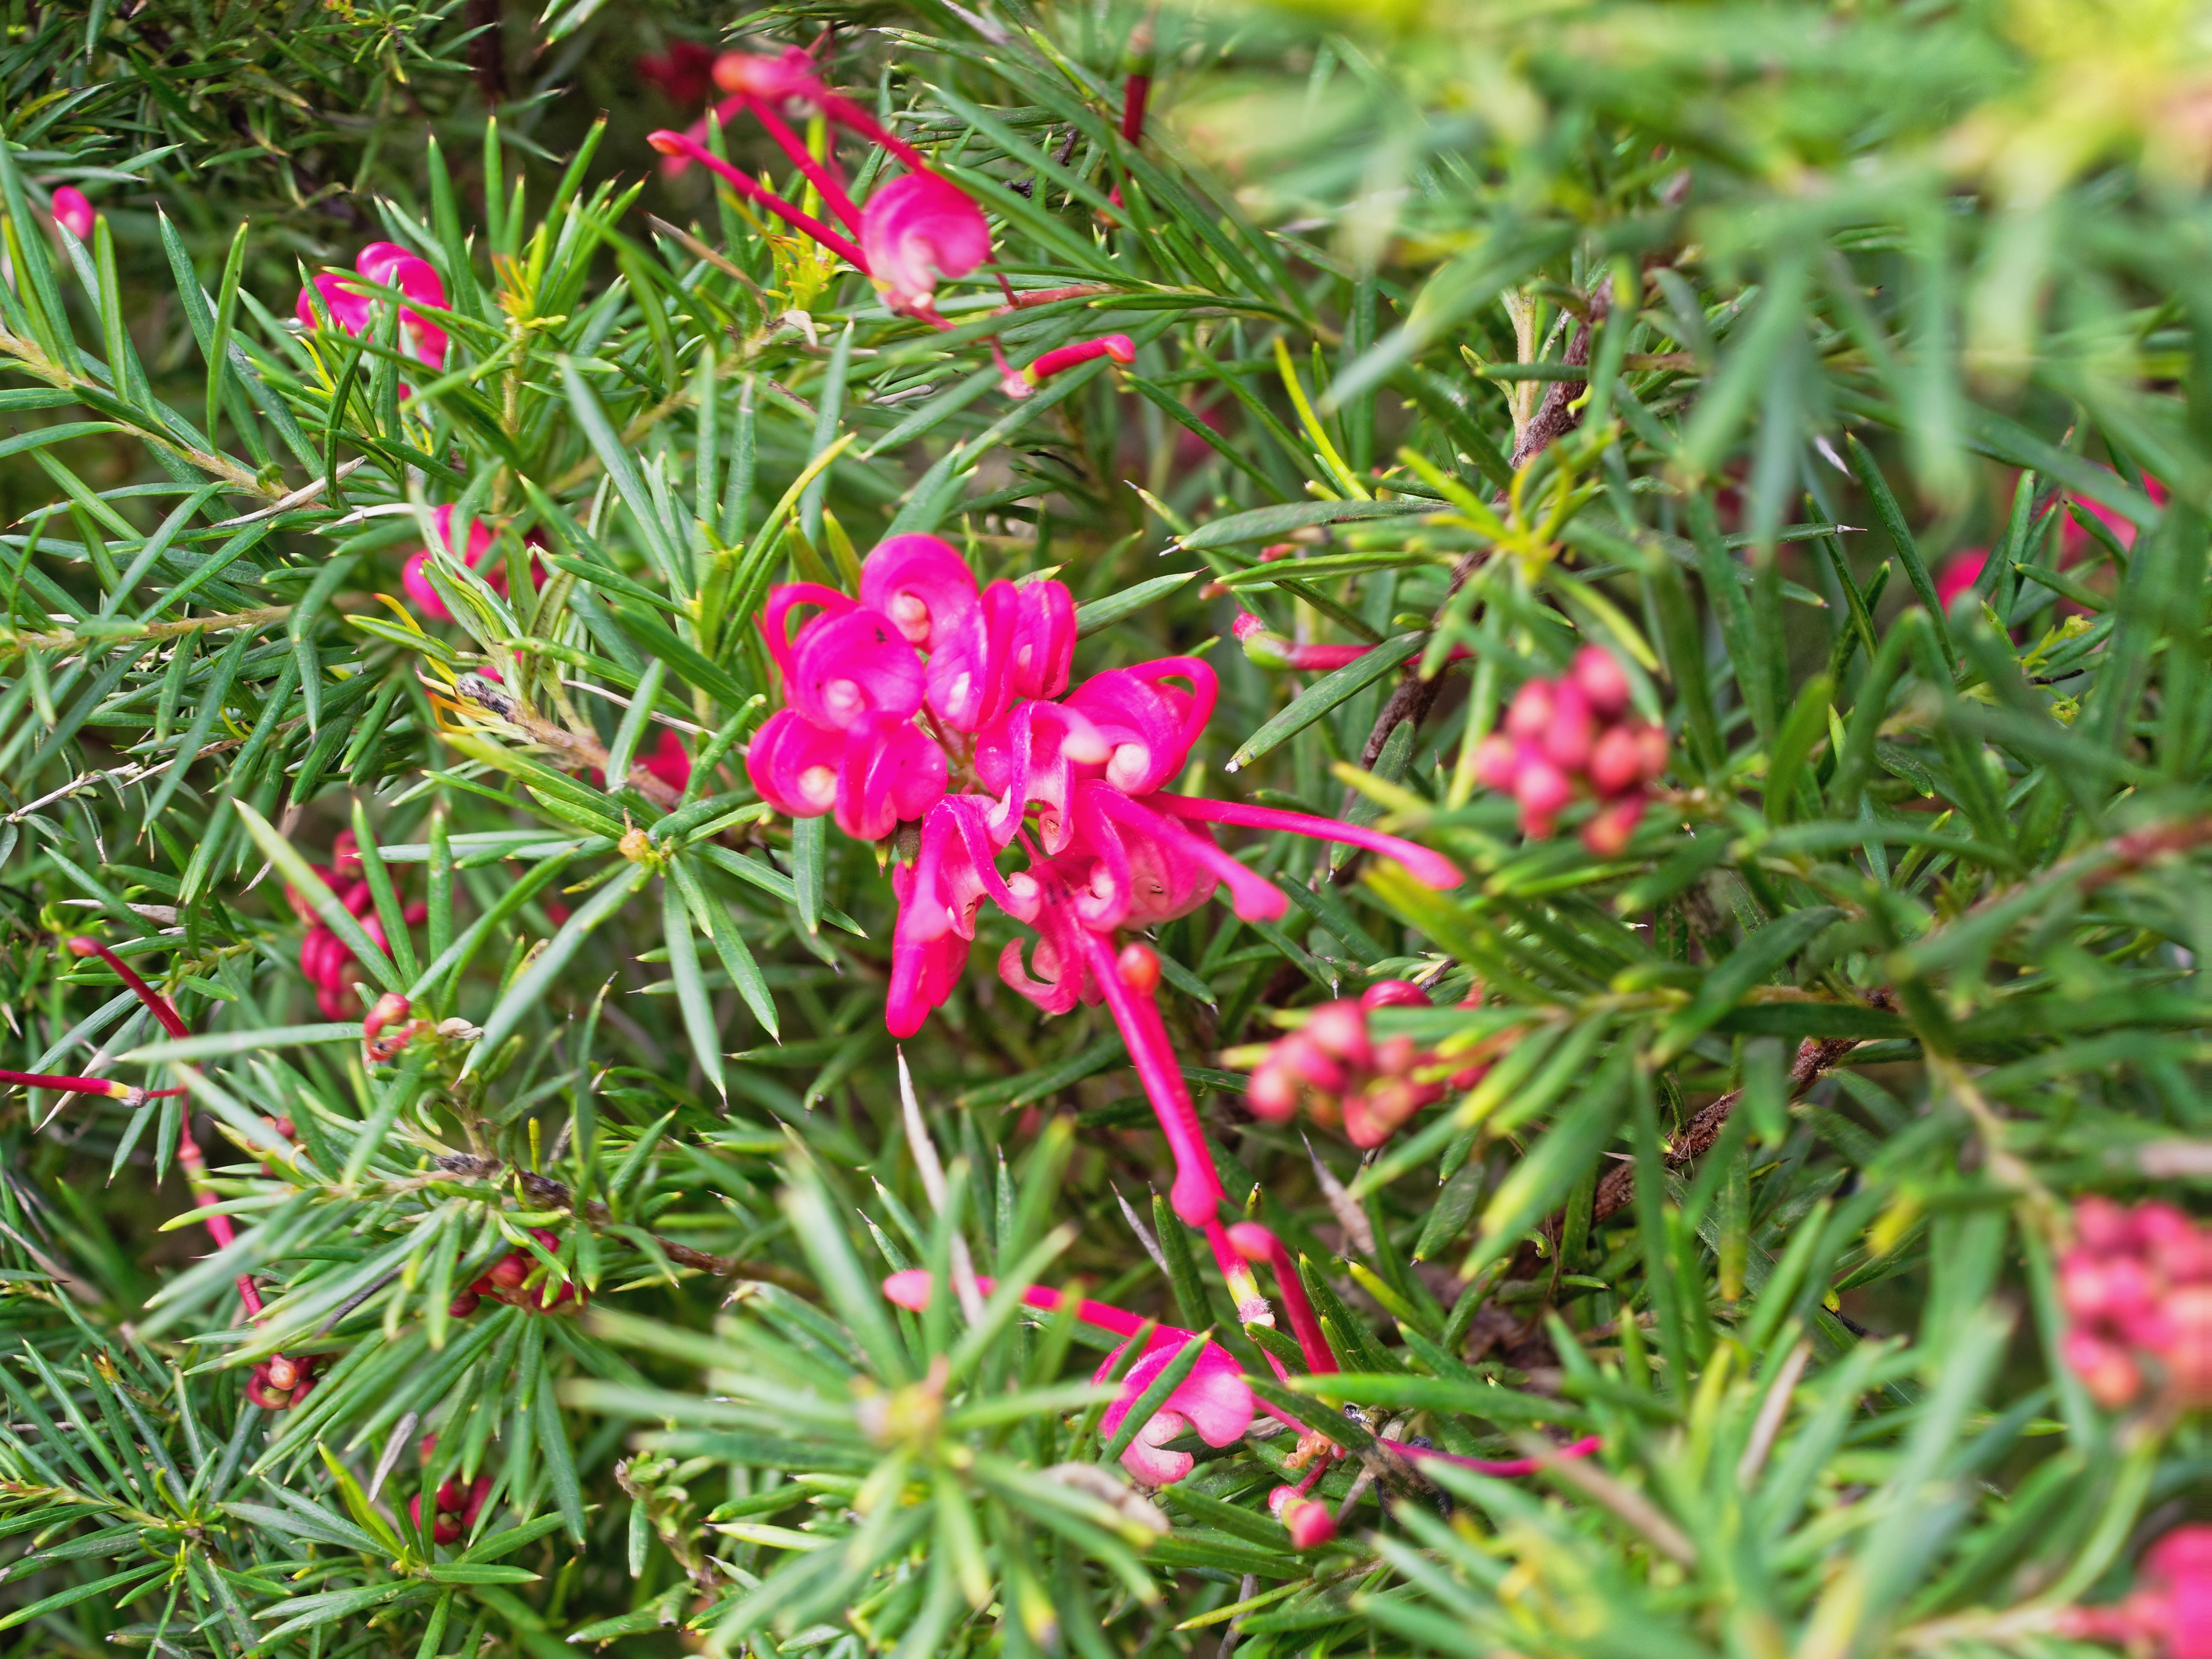 This should be Grevillea-rosmarinifolia-5-DMap.jpeg.  Is it missing?